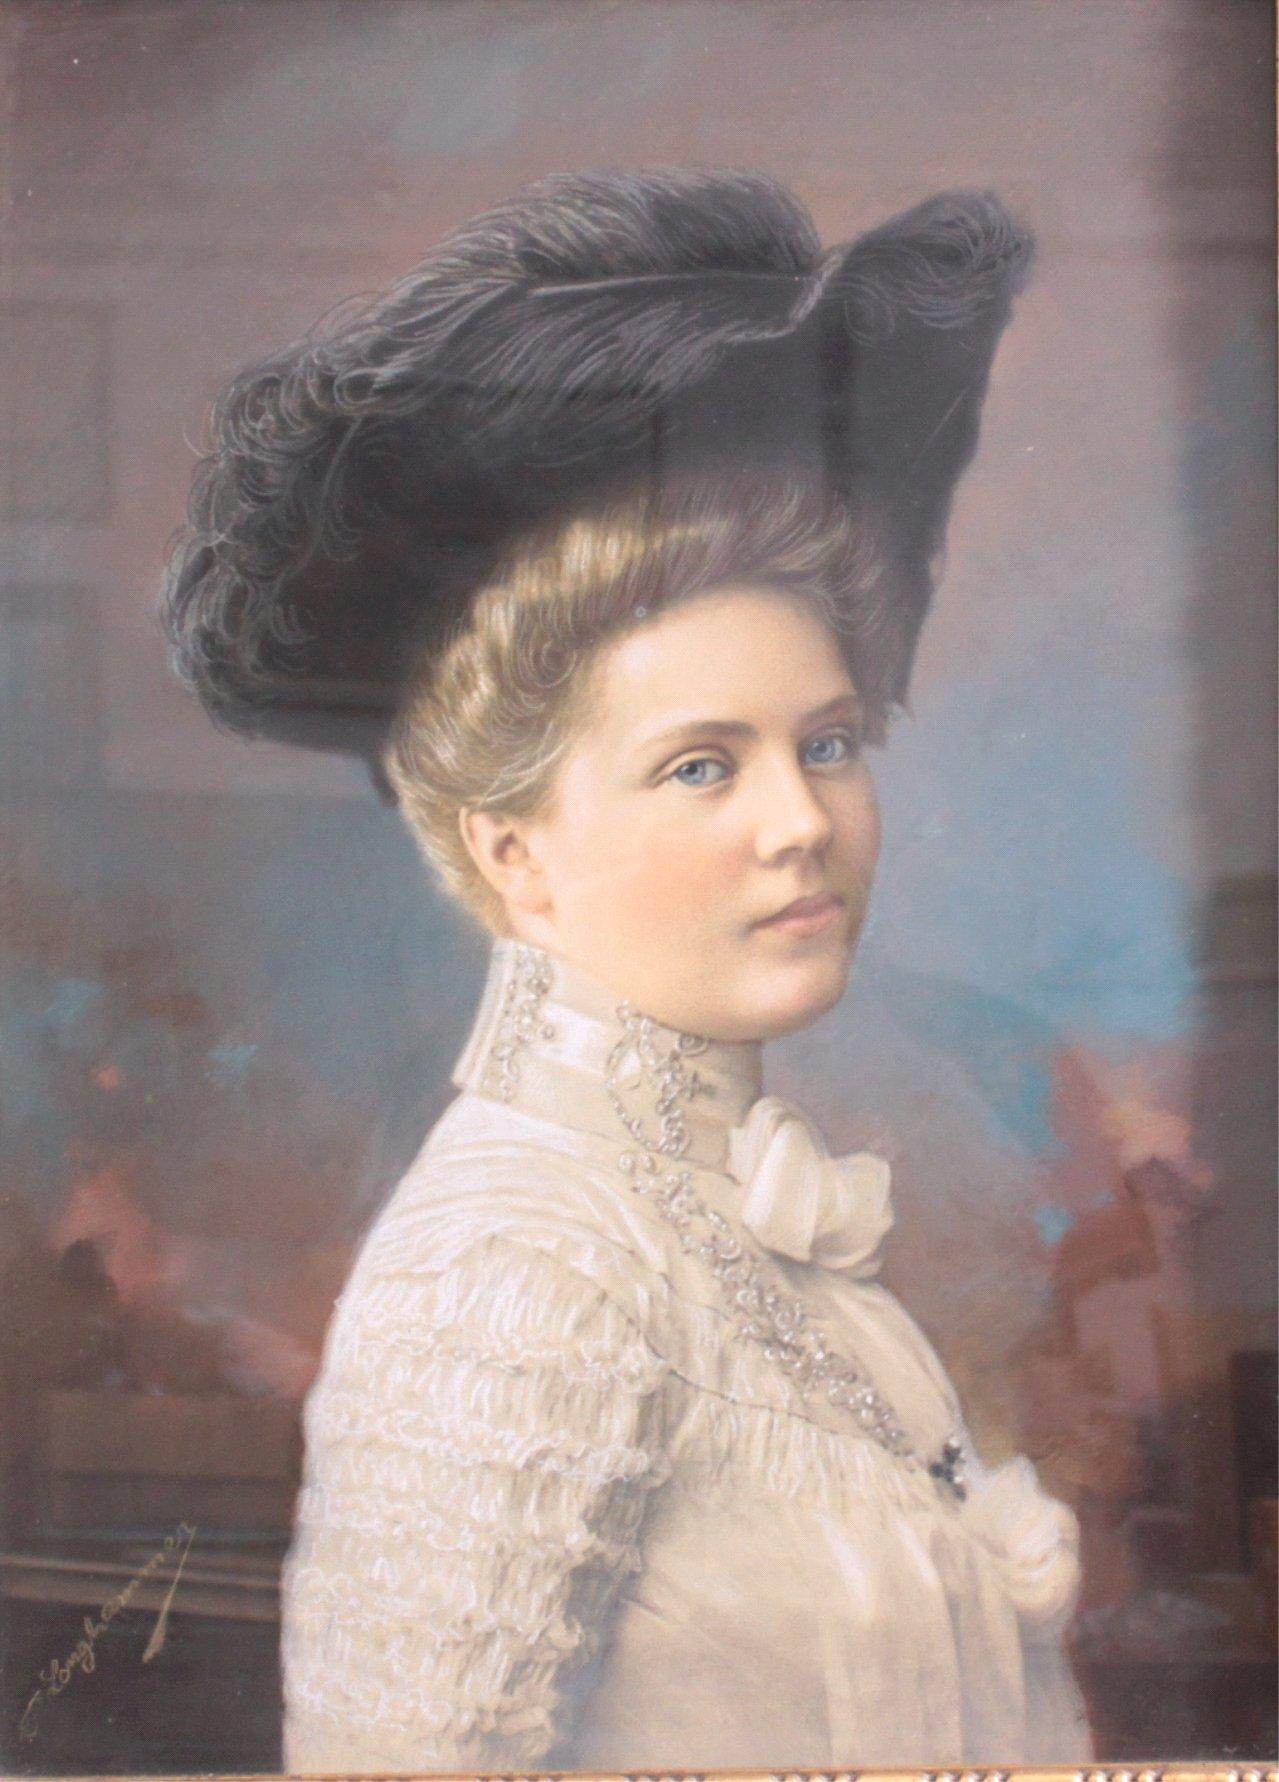 Damenbildnis des 19. Jahrhundert-1